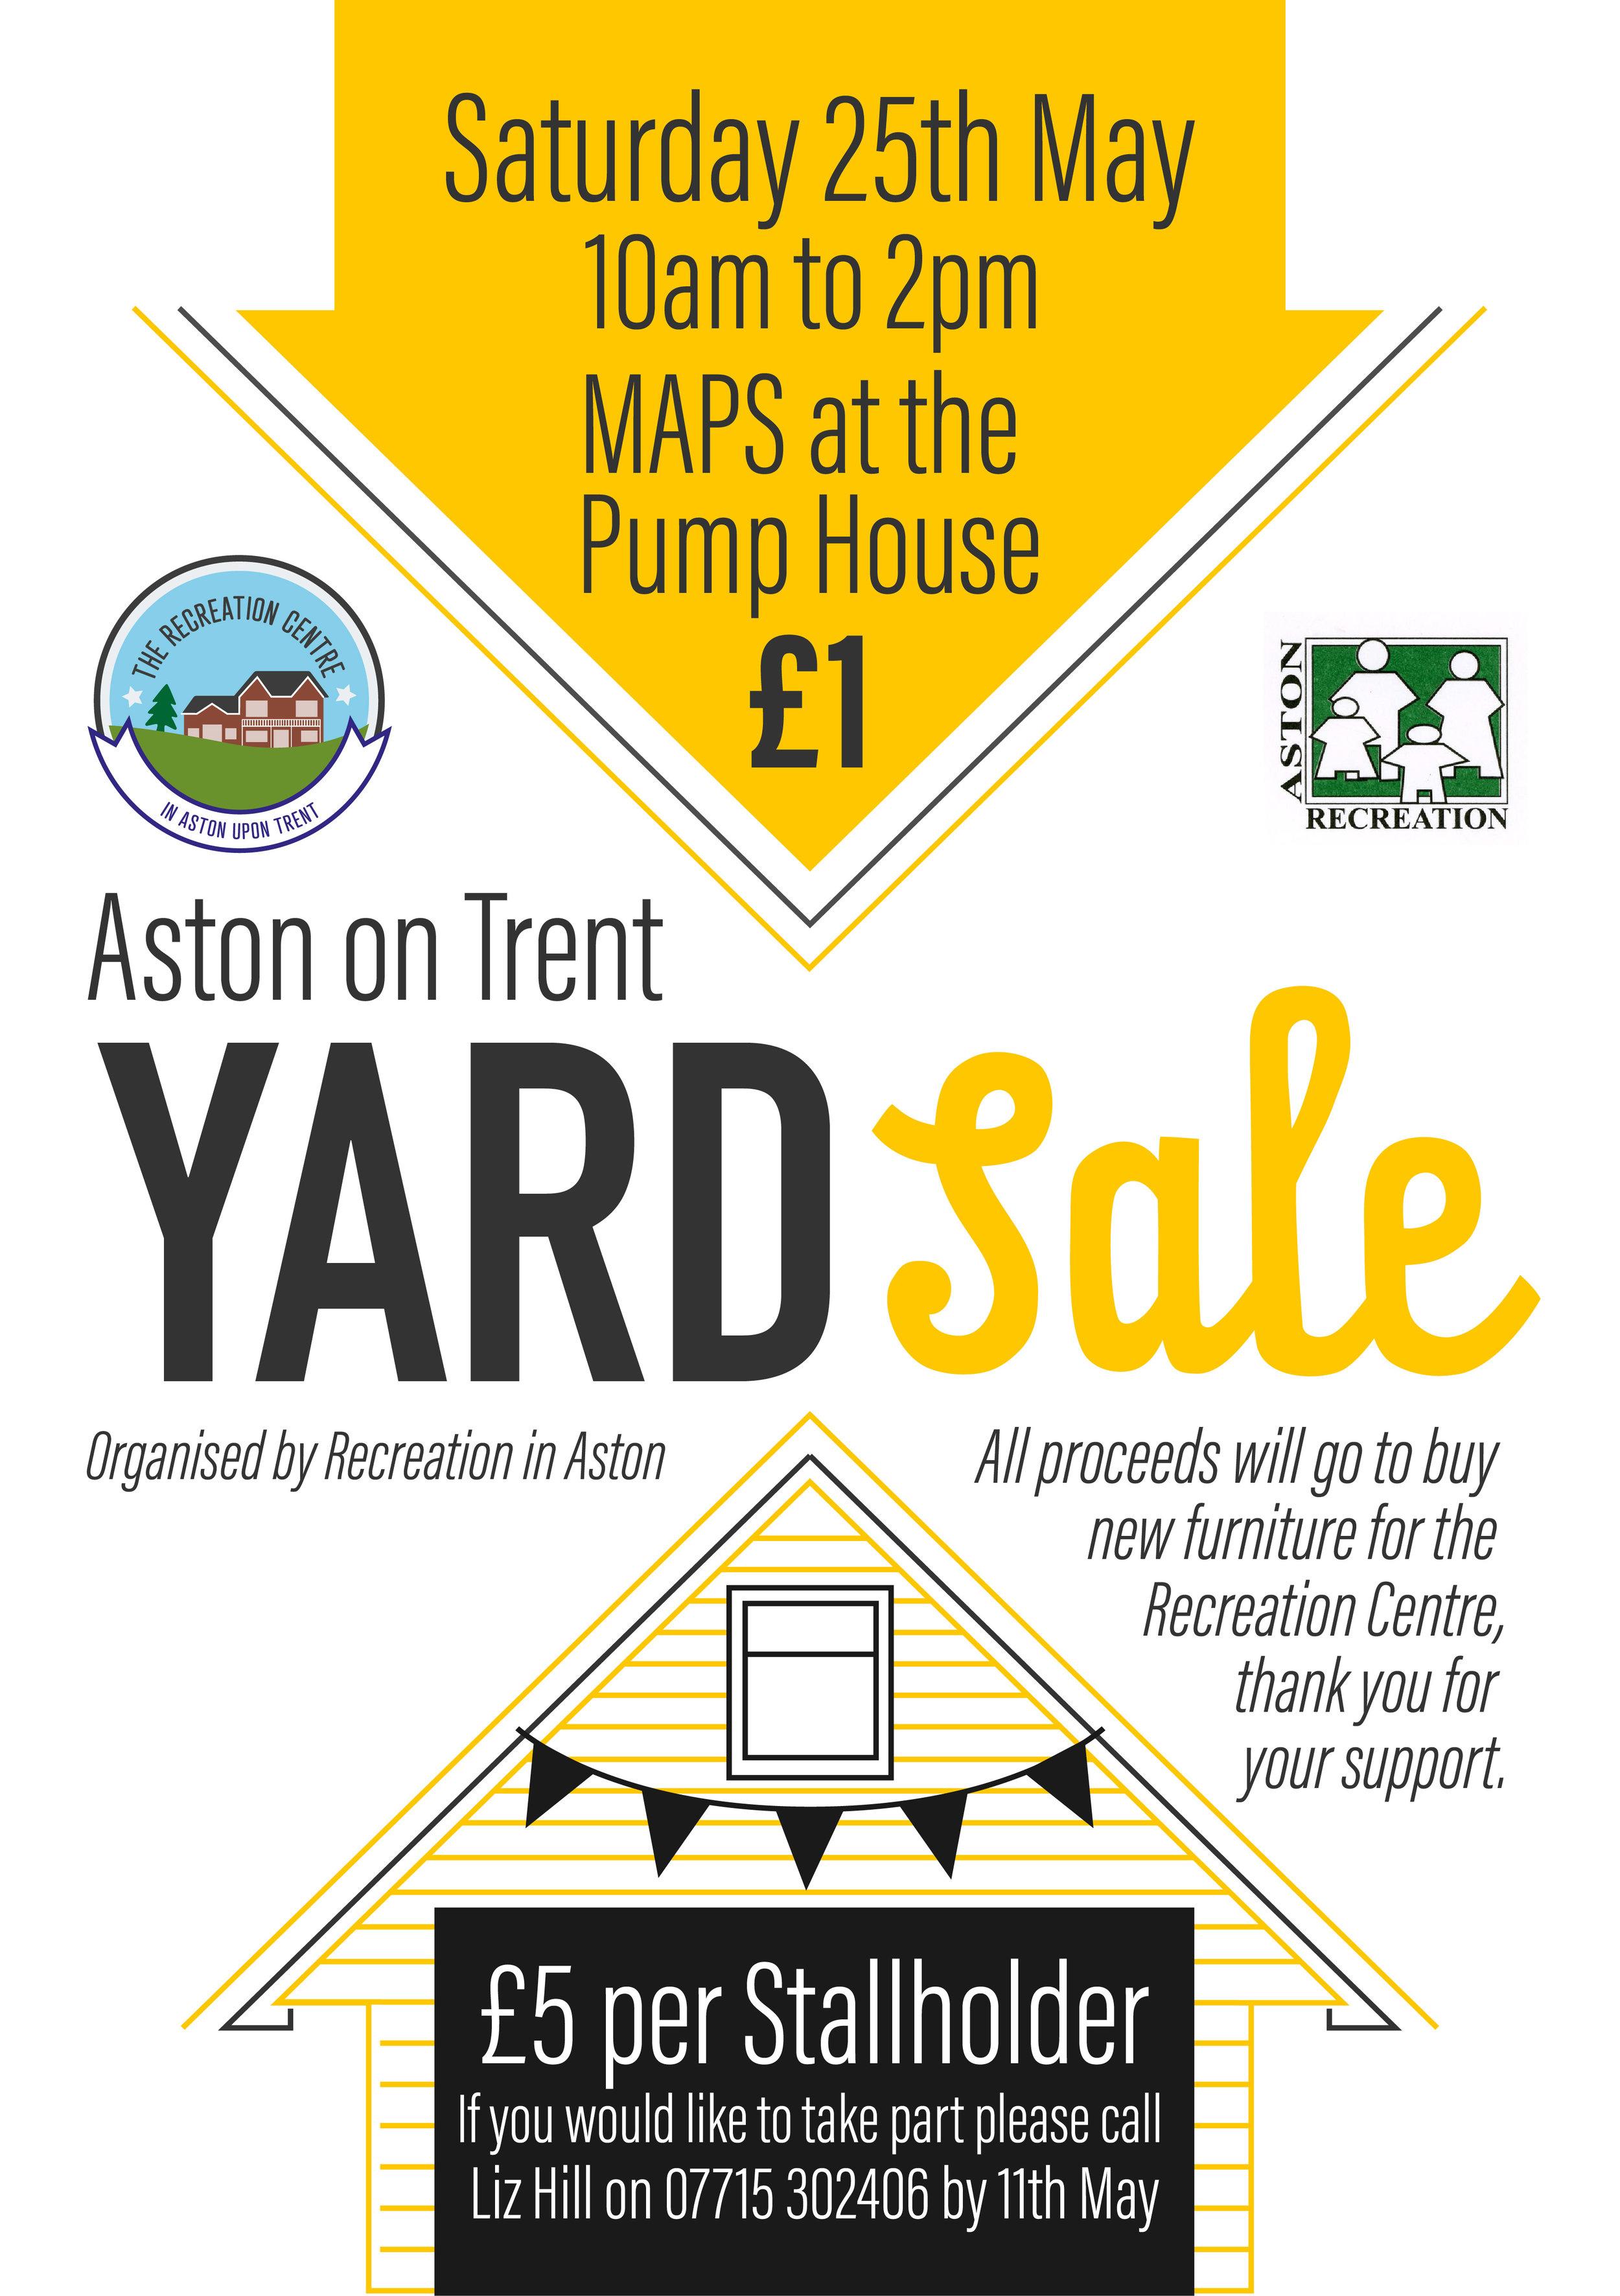 RIA Yard Sale Poster 2019.jpg